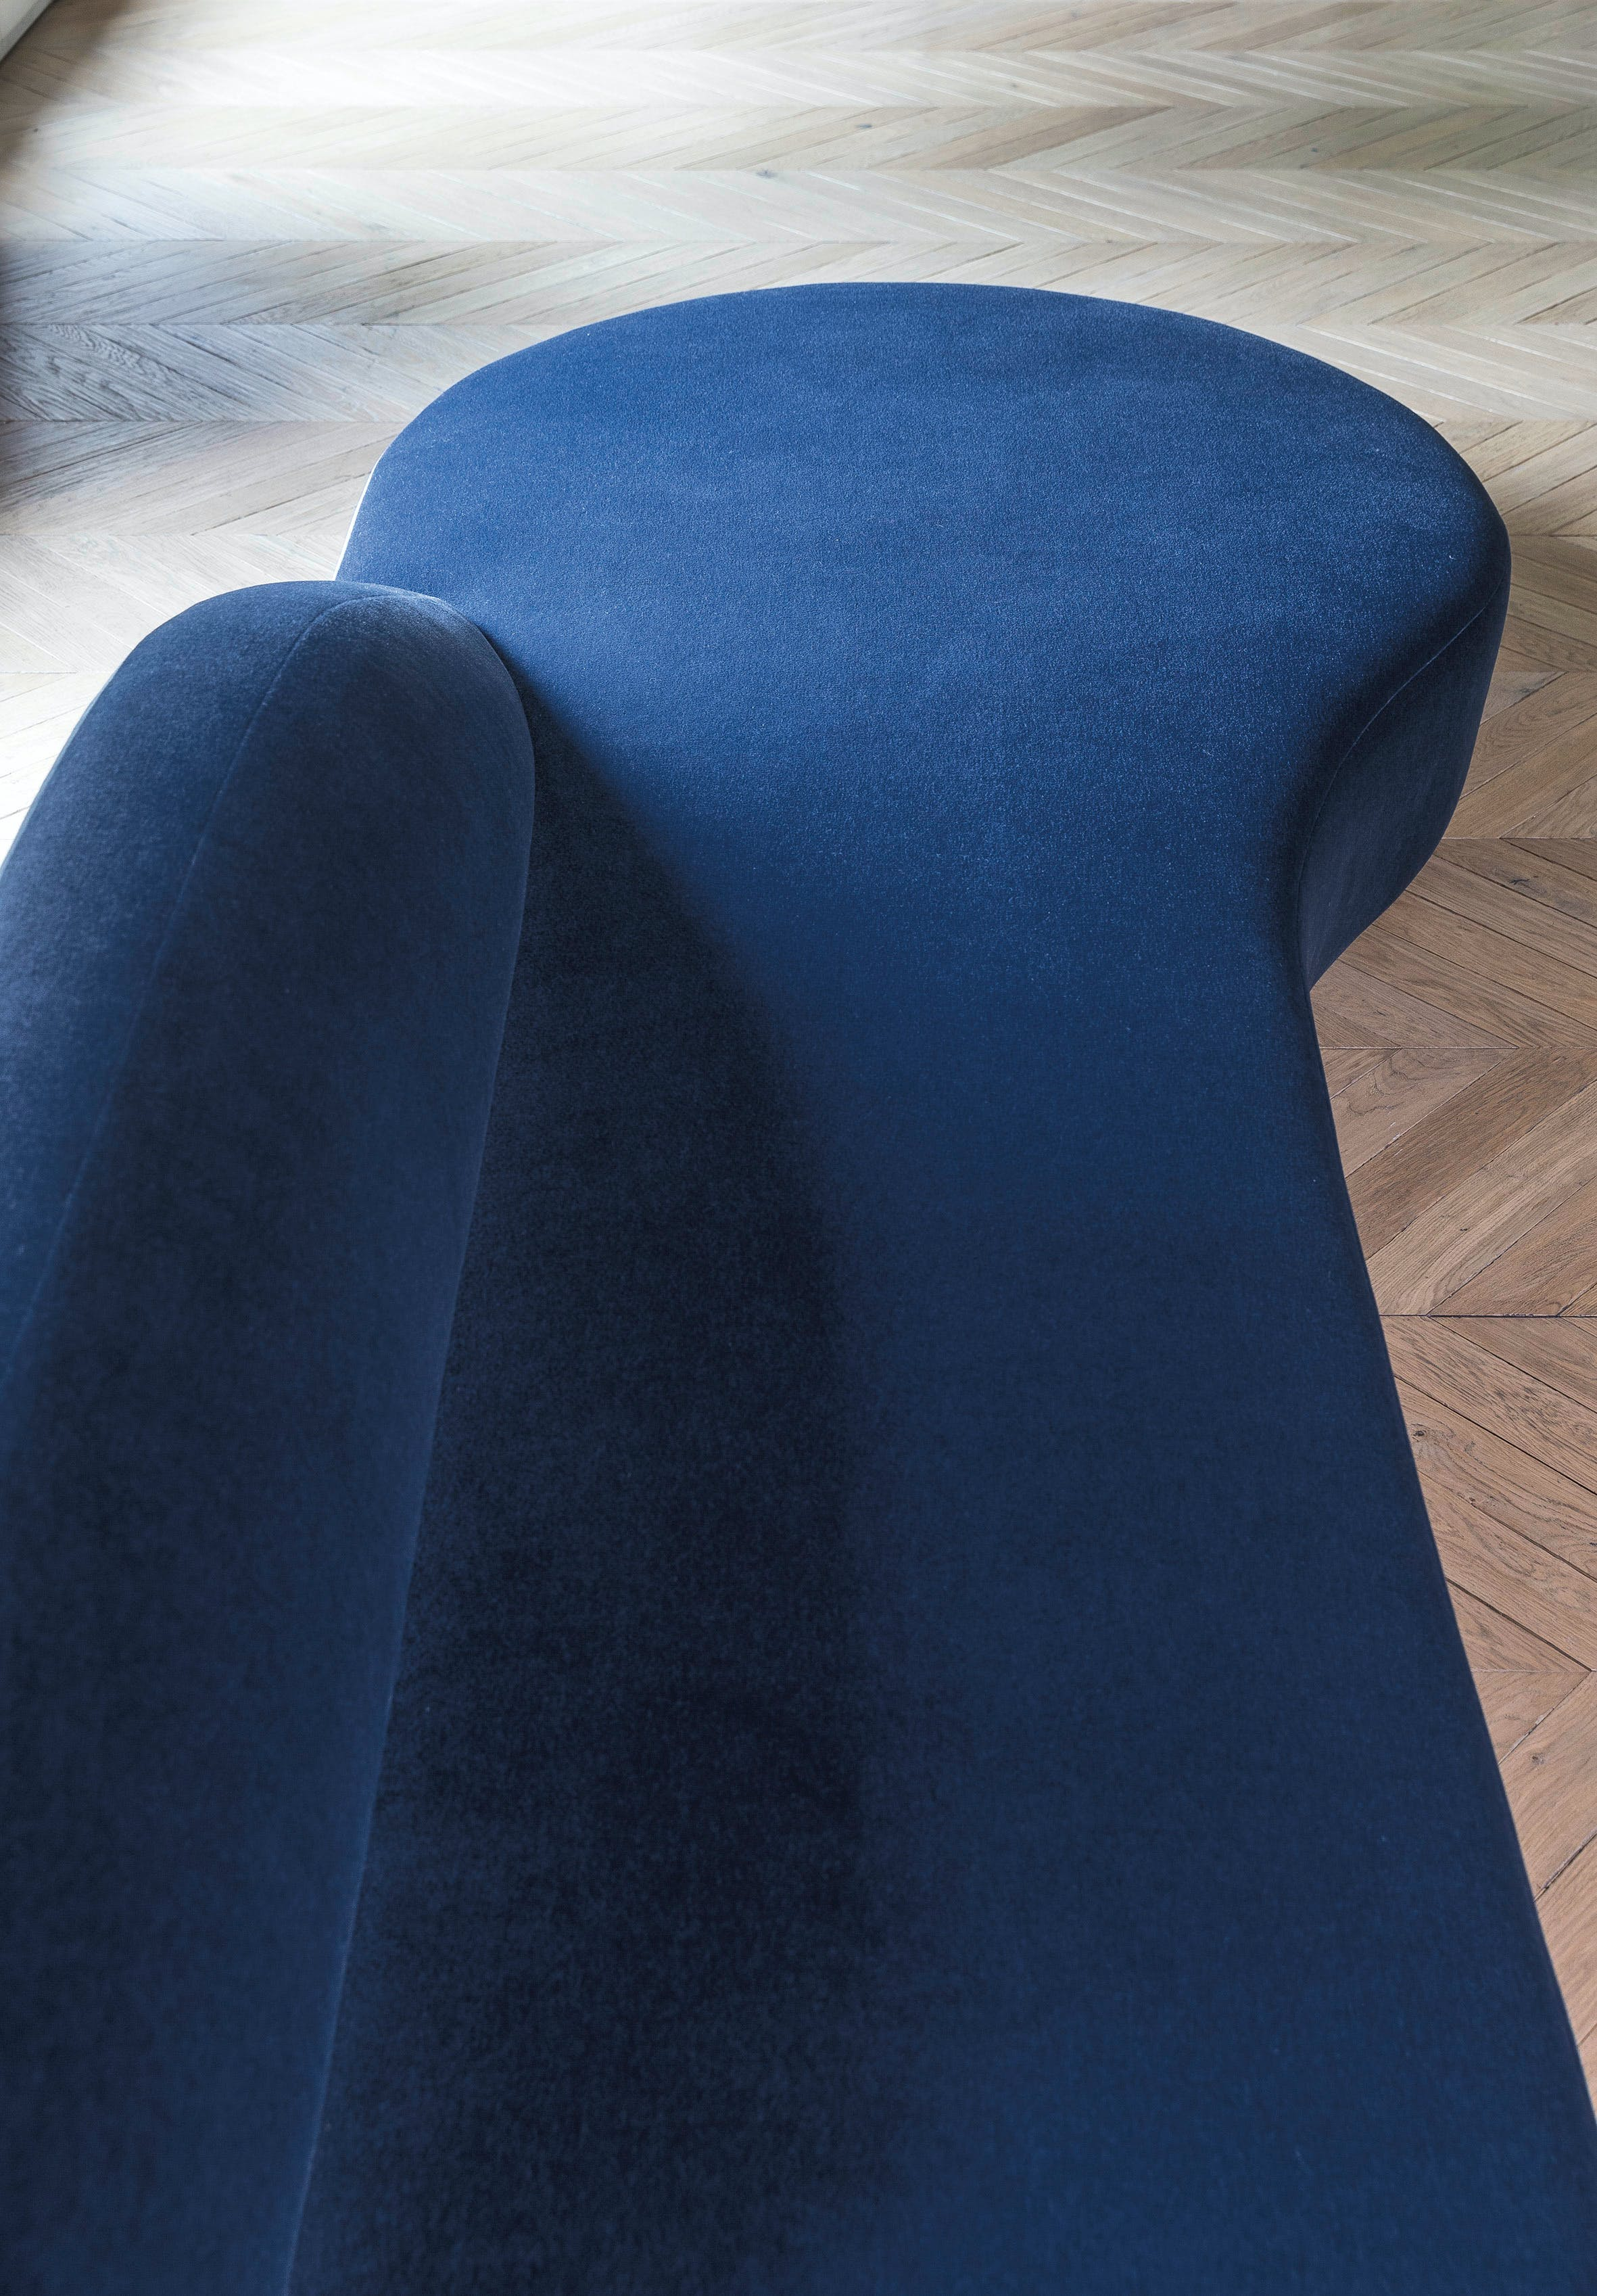 Lacividina-guest-sofa-detail-2-haute-living